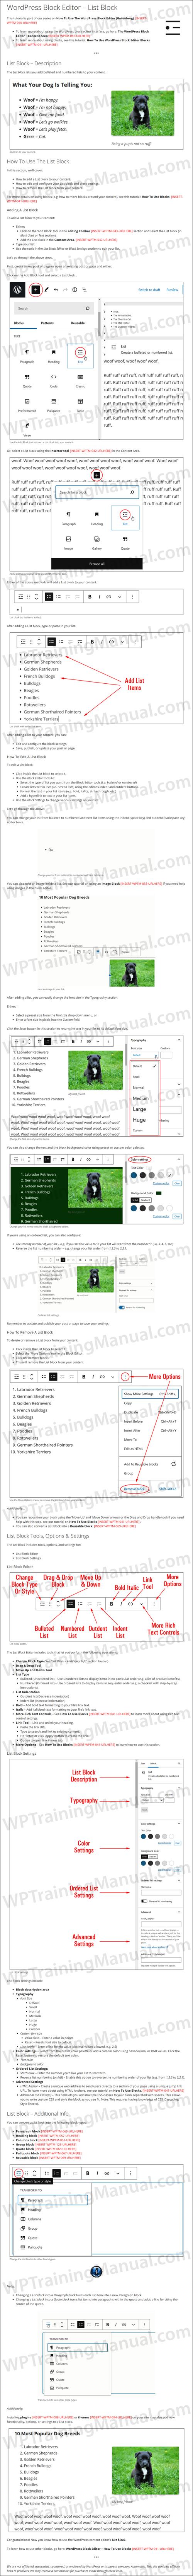 White Label Tutorial: WordPress Block Editor - List Block - WPTrainingManual.com